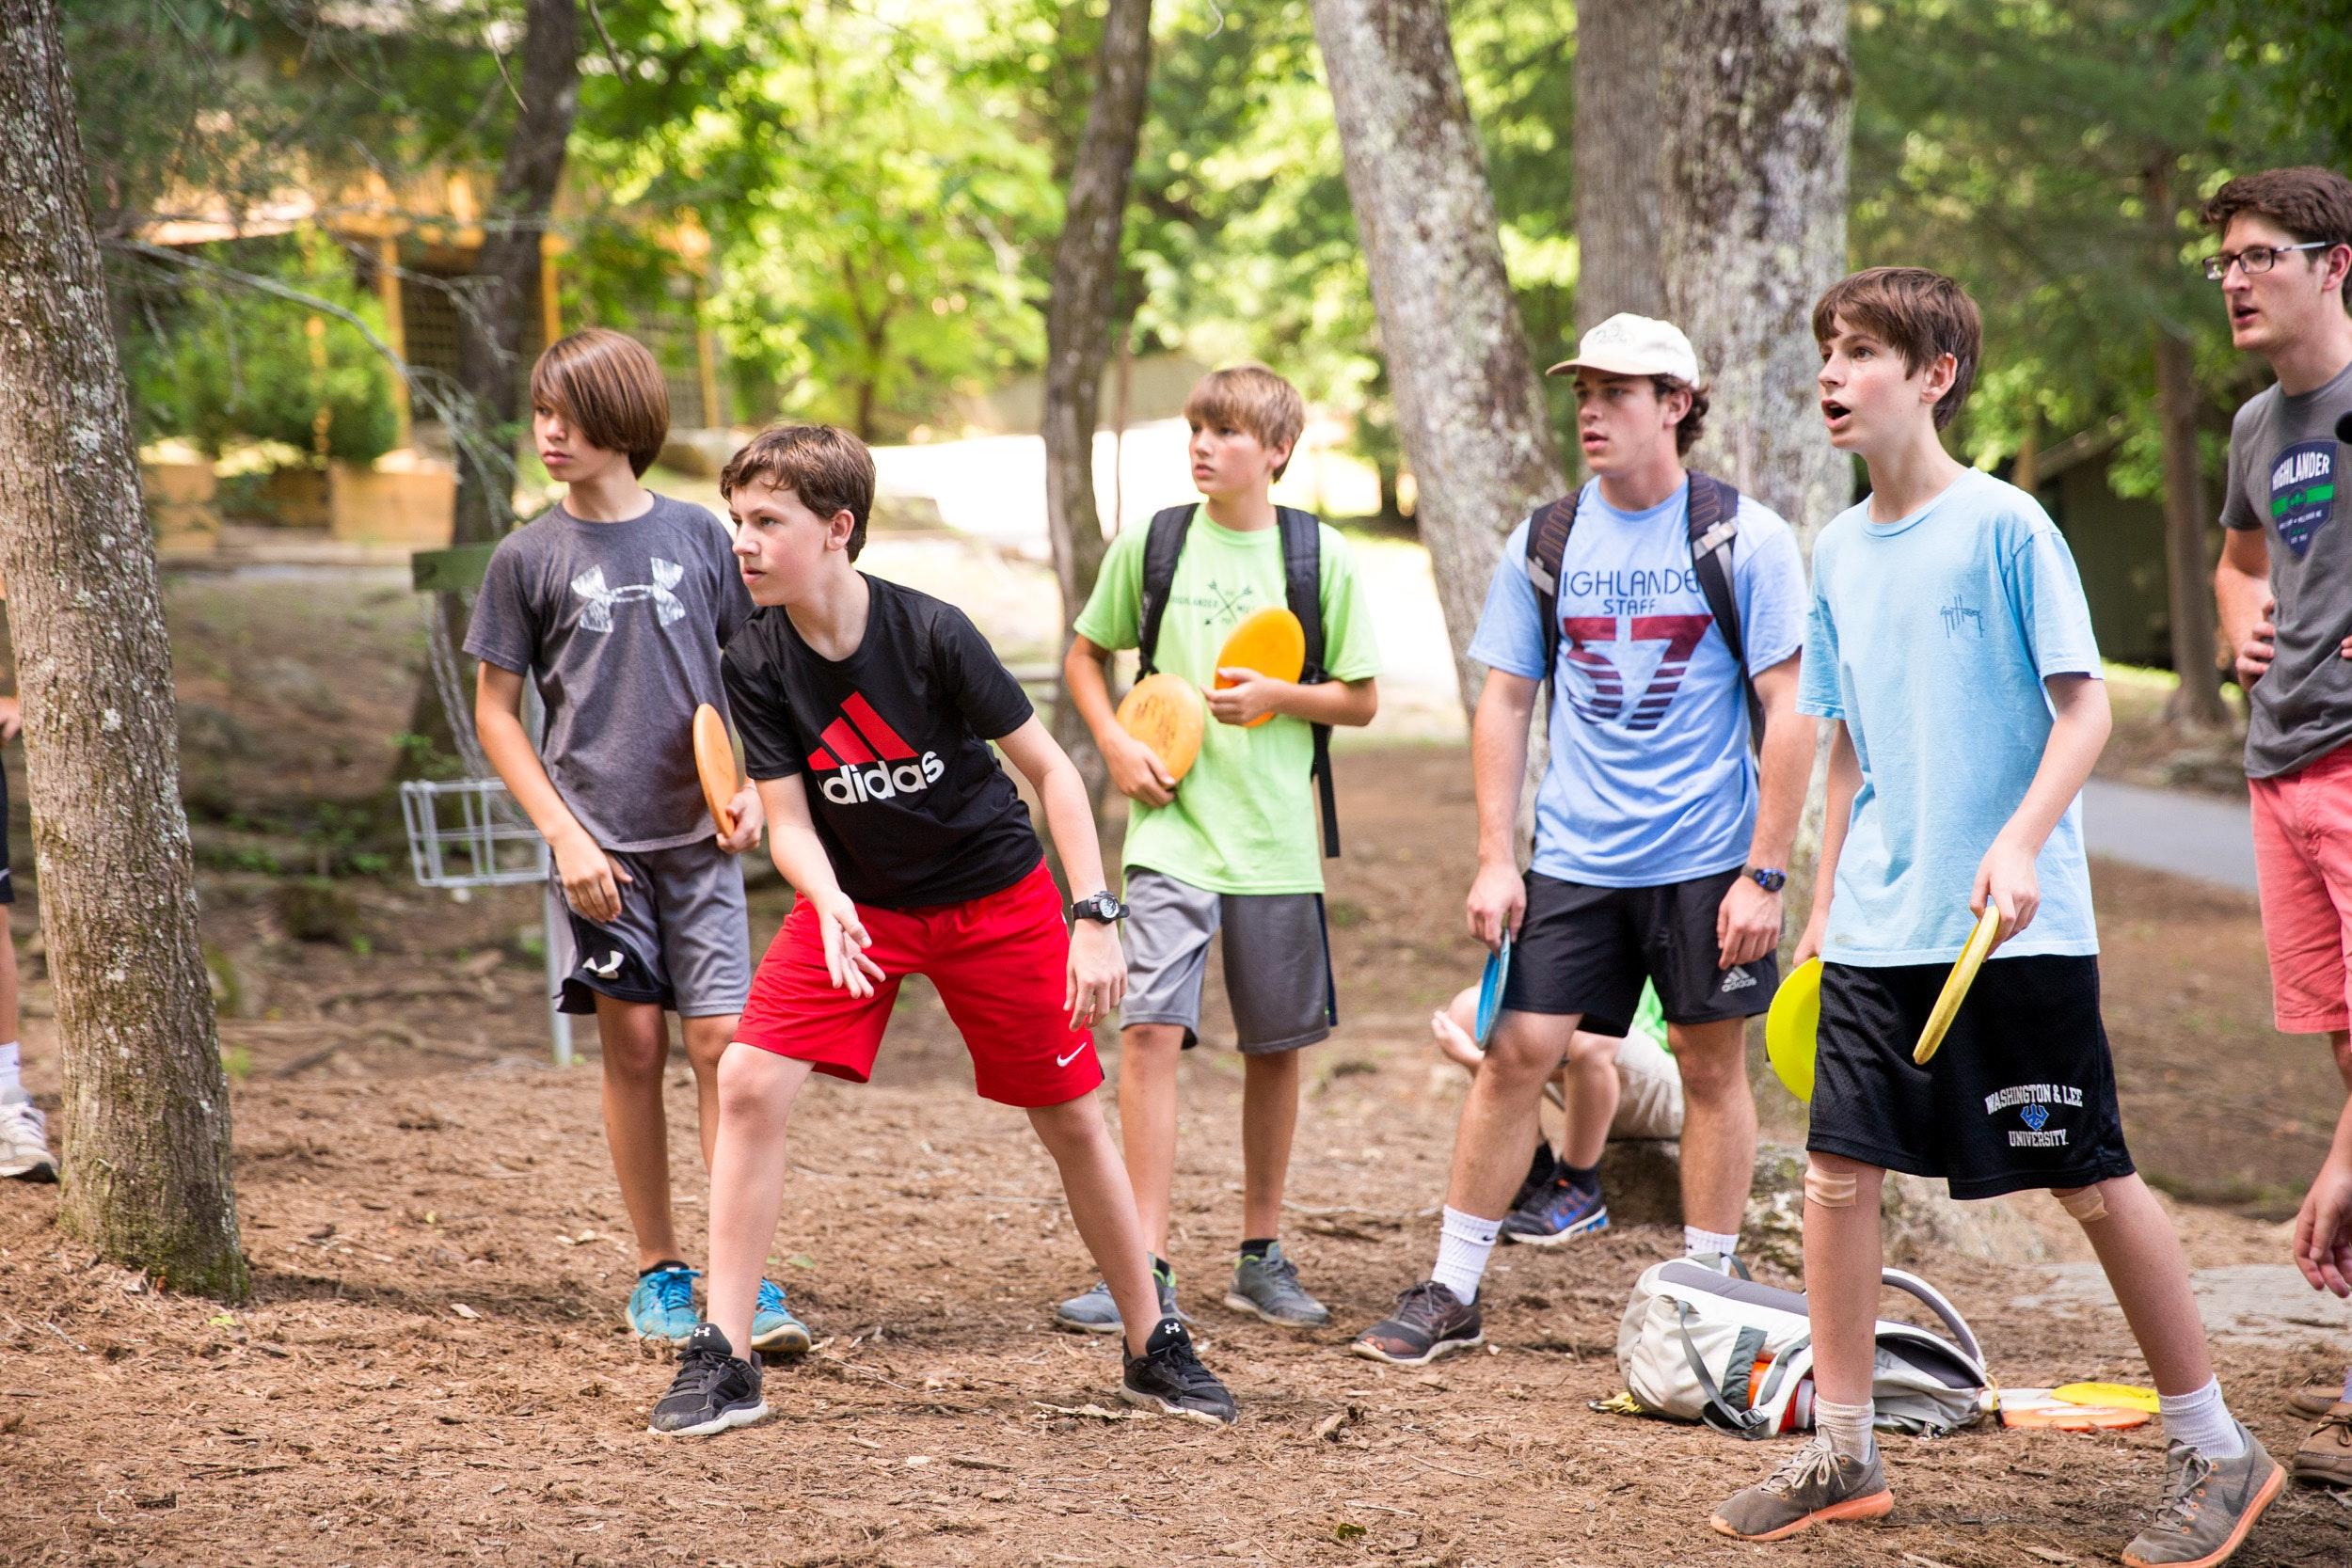 Senior camp activities at highlander coed summer camp north carolina.jpg?ixlib=rails 2.1